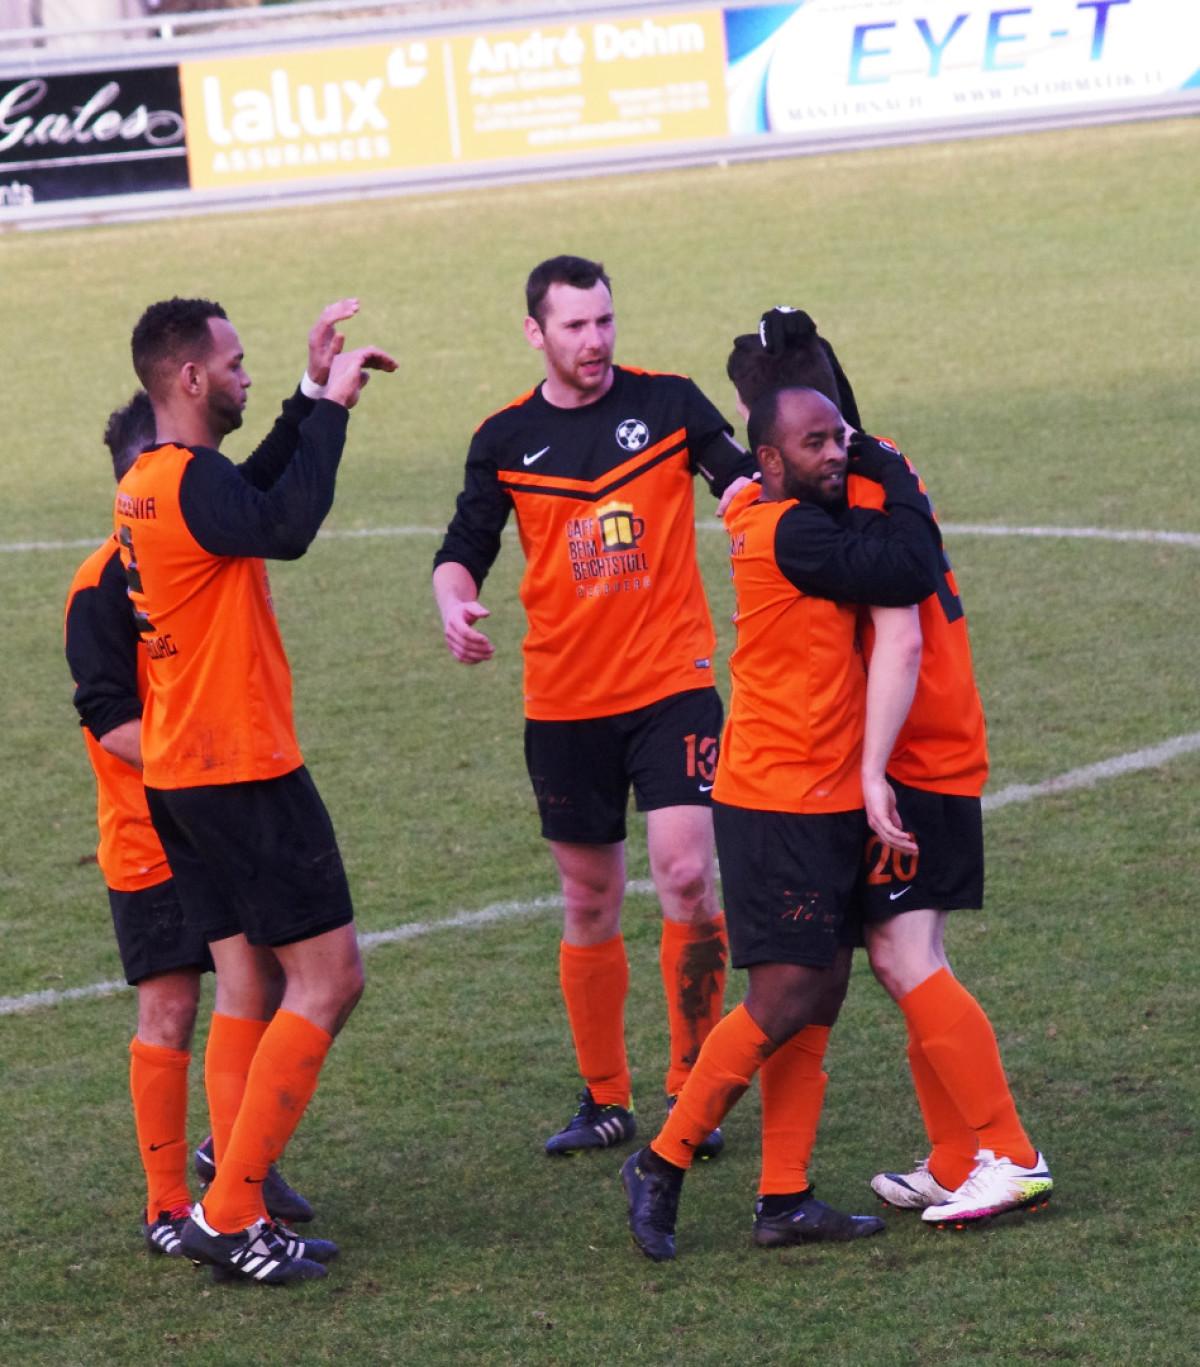 Berbourg - Junglinster Saison 2016/2017